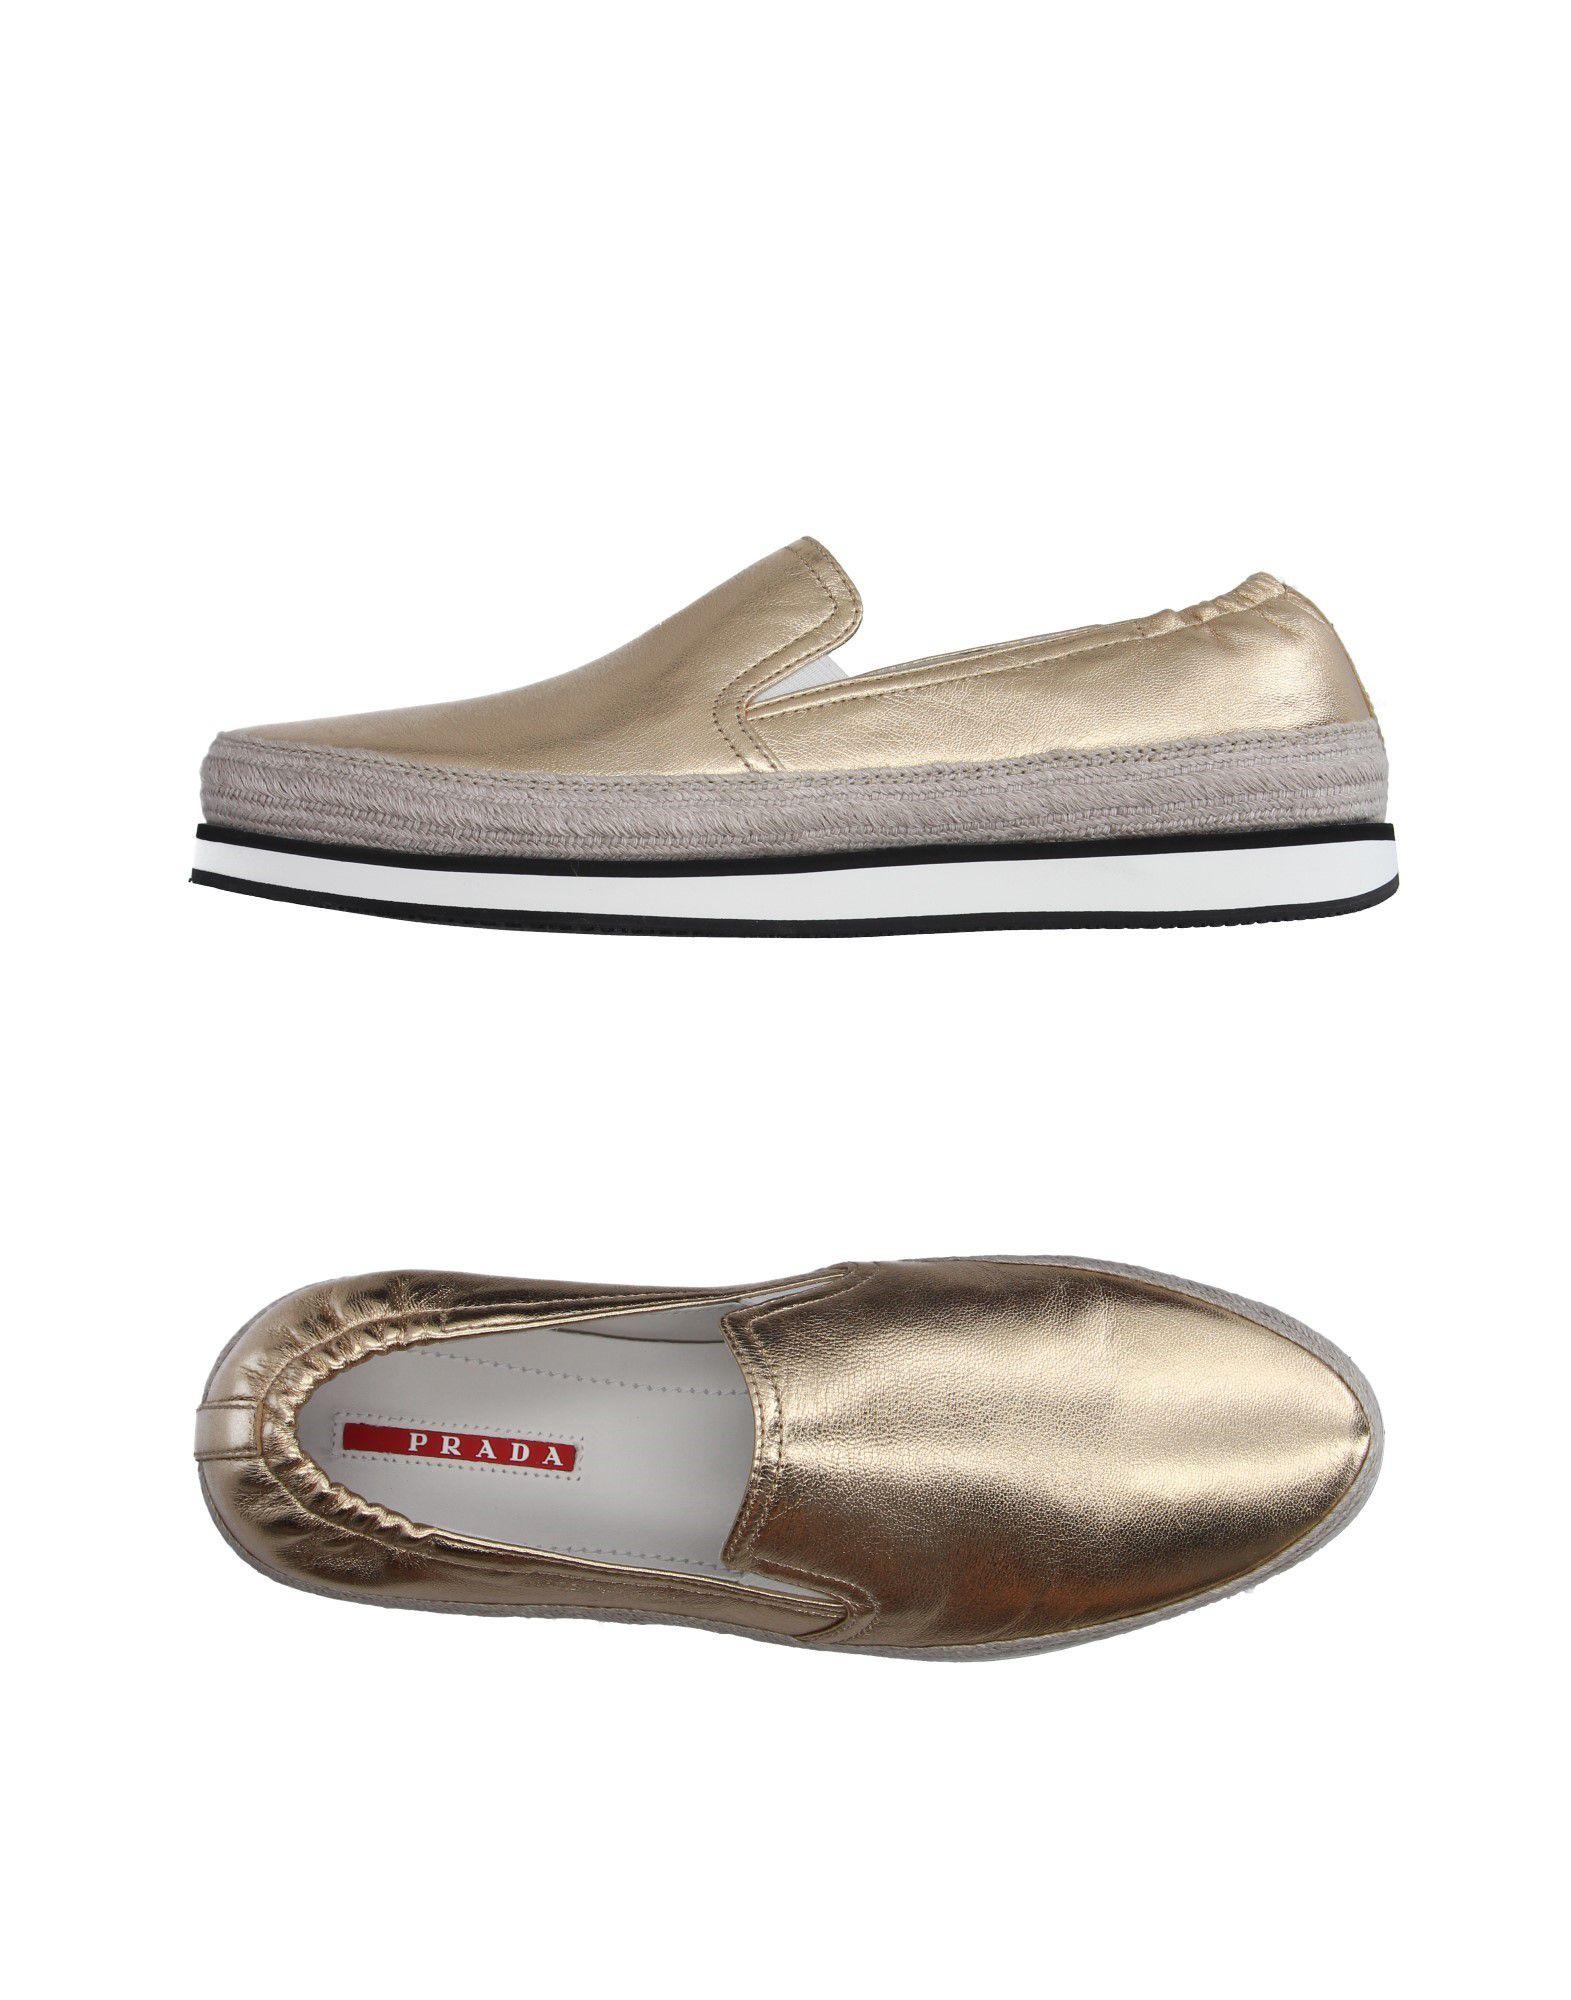 PRADA SPORT Damen Low Sneakers & Tennisschuhe Farbe Gold Größe 7